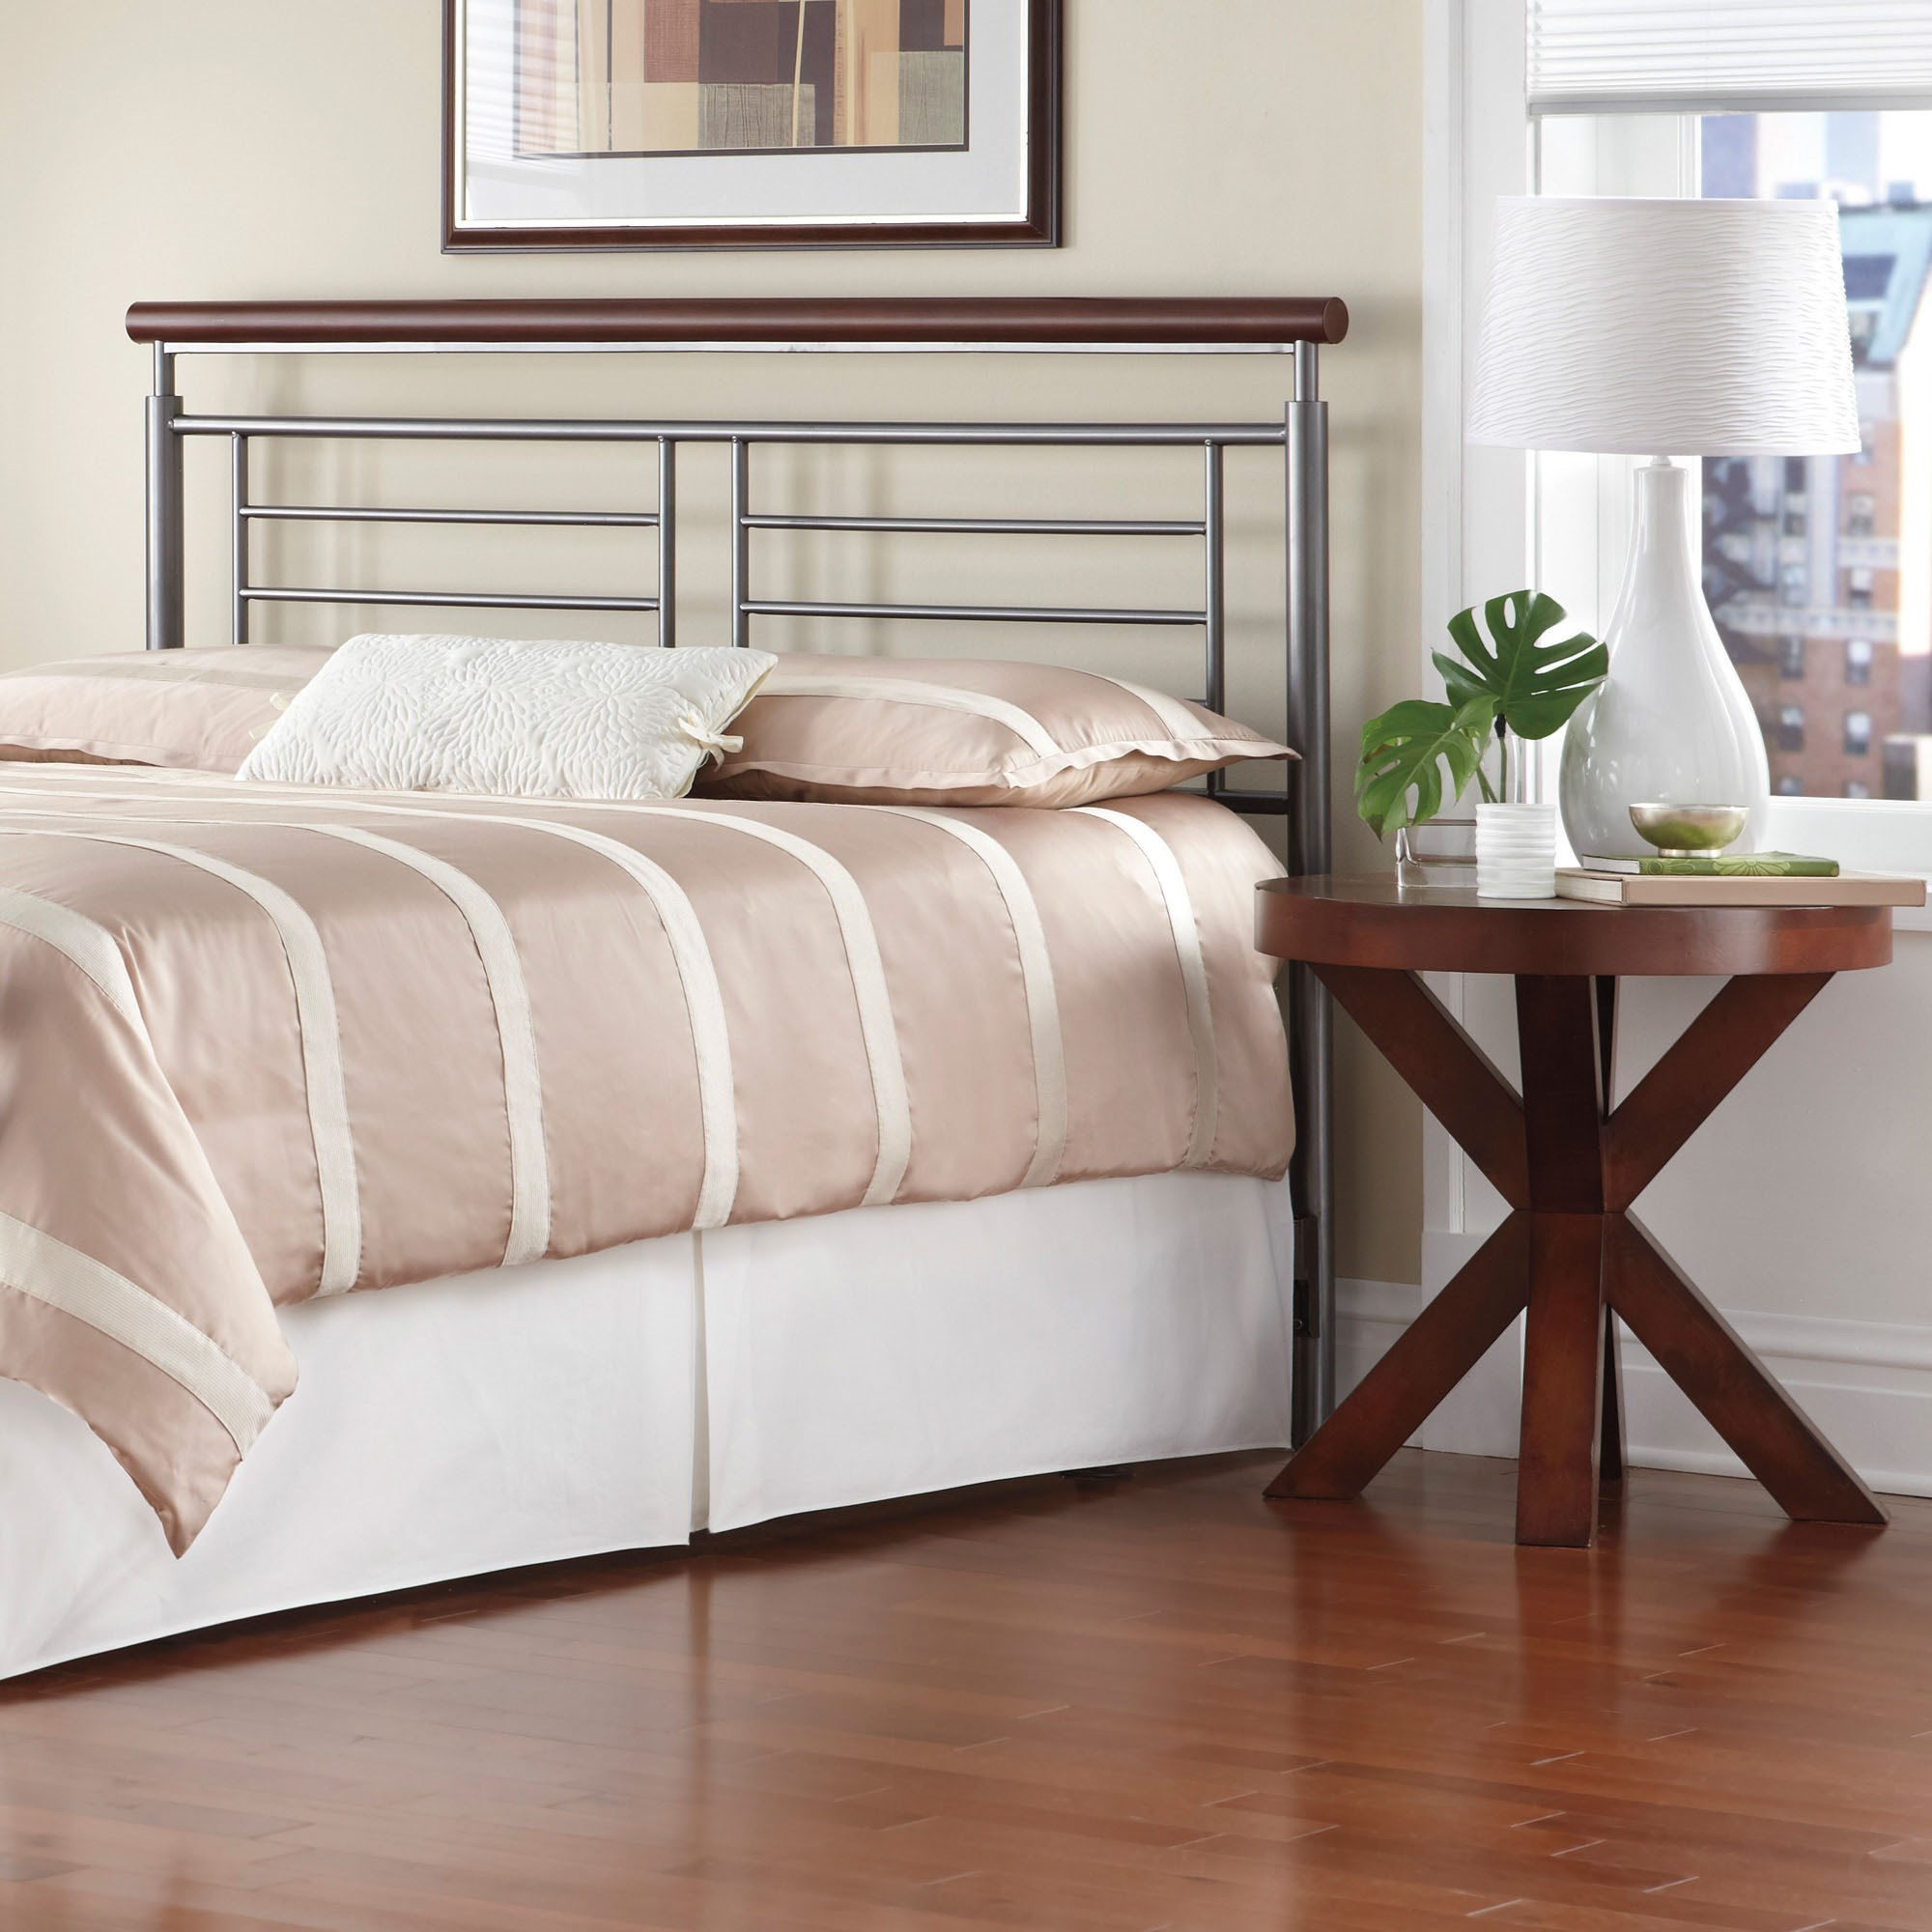 fashion bed group wood and metal beds b12976 king fontane headboard baer 39 s furniture headboards. Black Bedroom Furniture Sets. Home Design Ideas